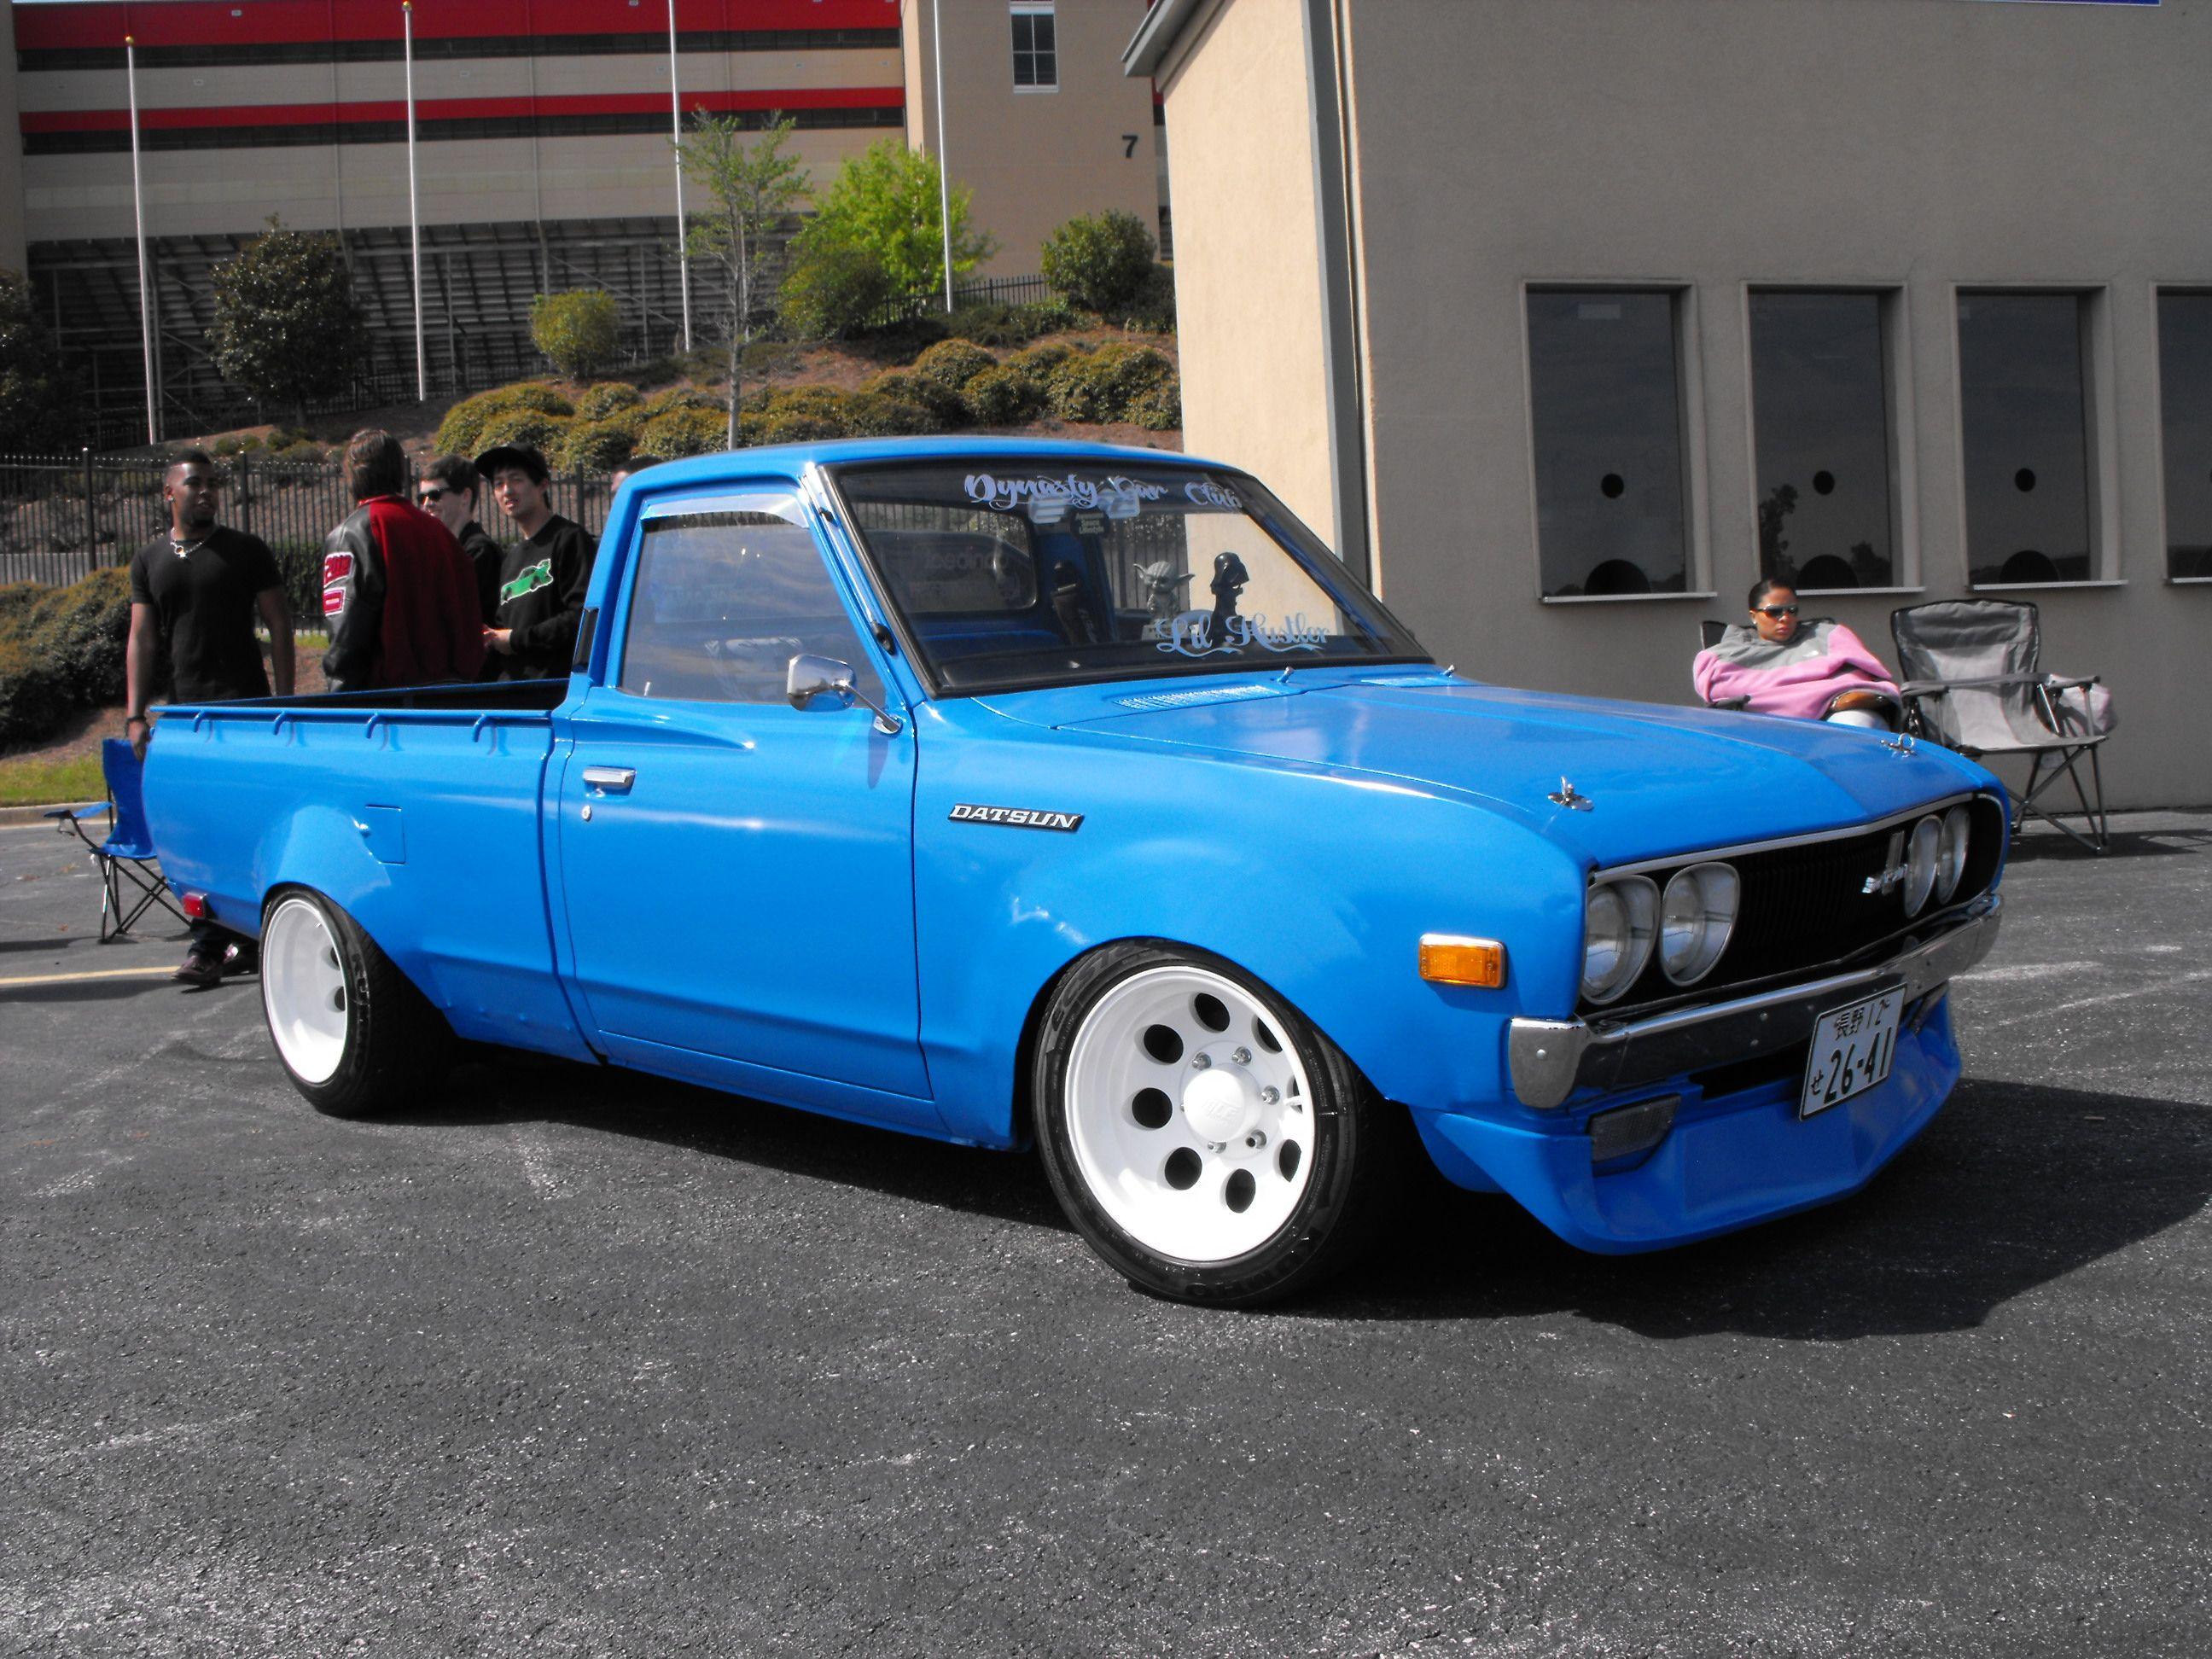 Datsun 620 Widebody Datsun 620 Jdm Cars Rims Tires Mini Trucks